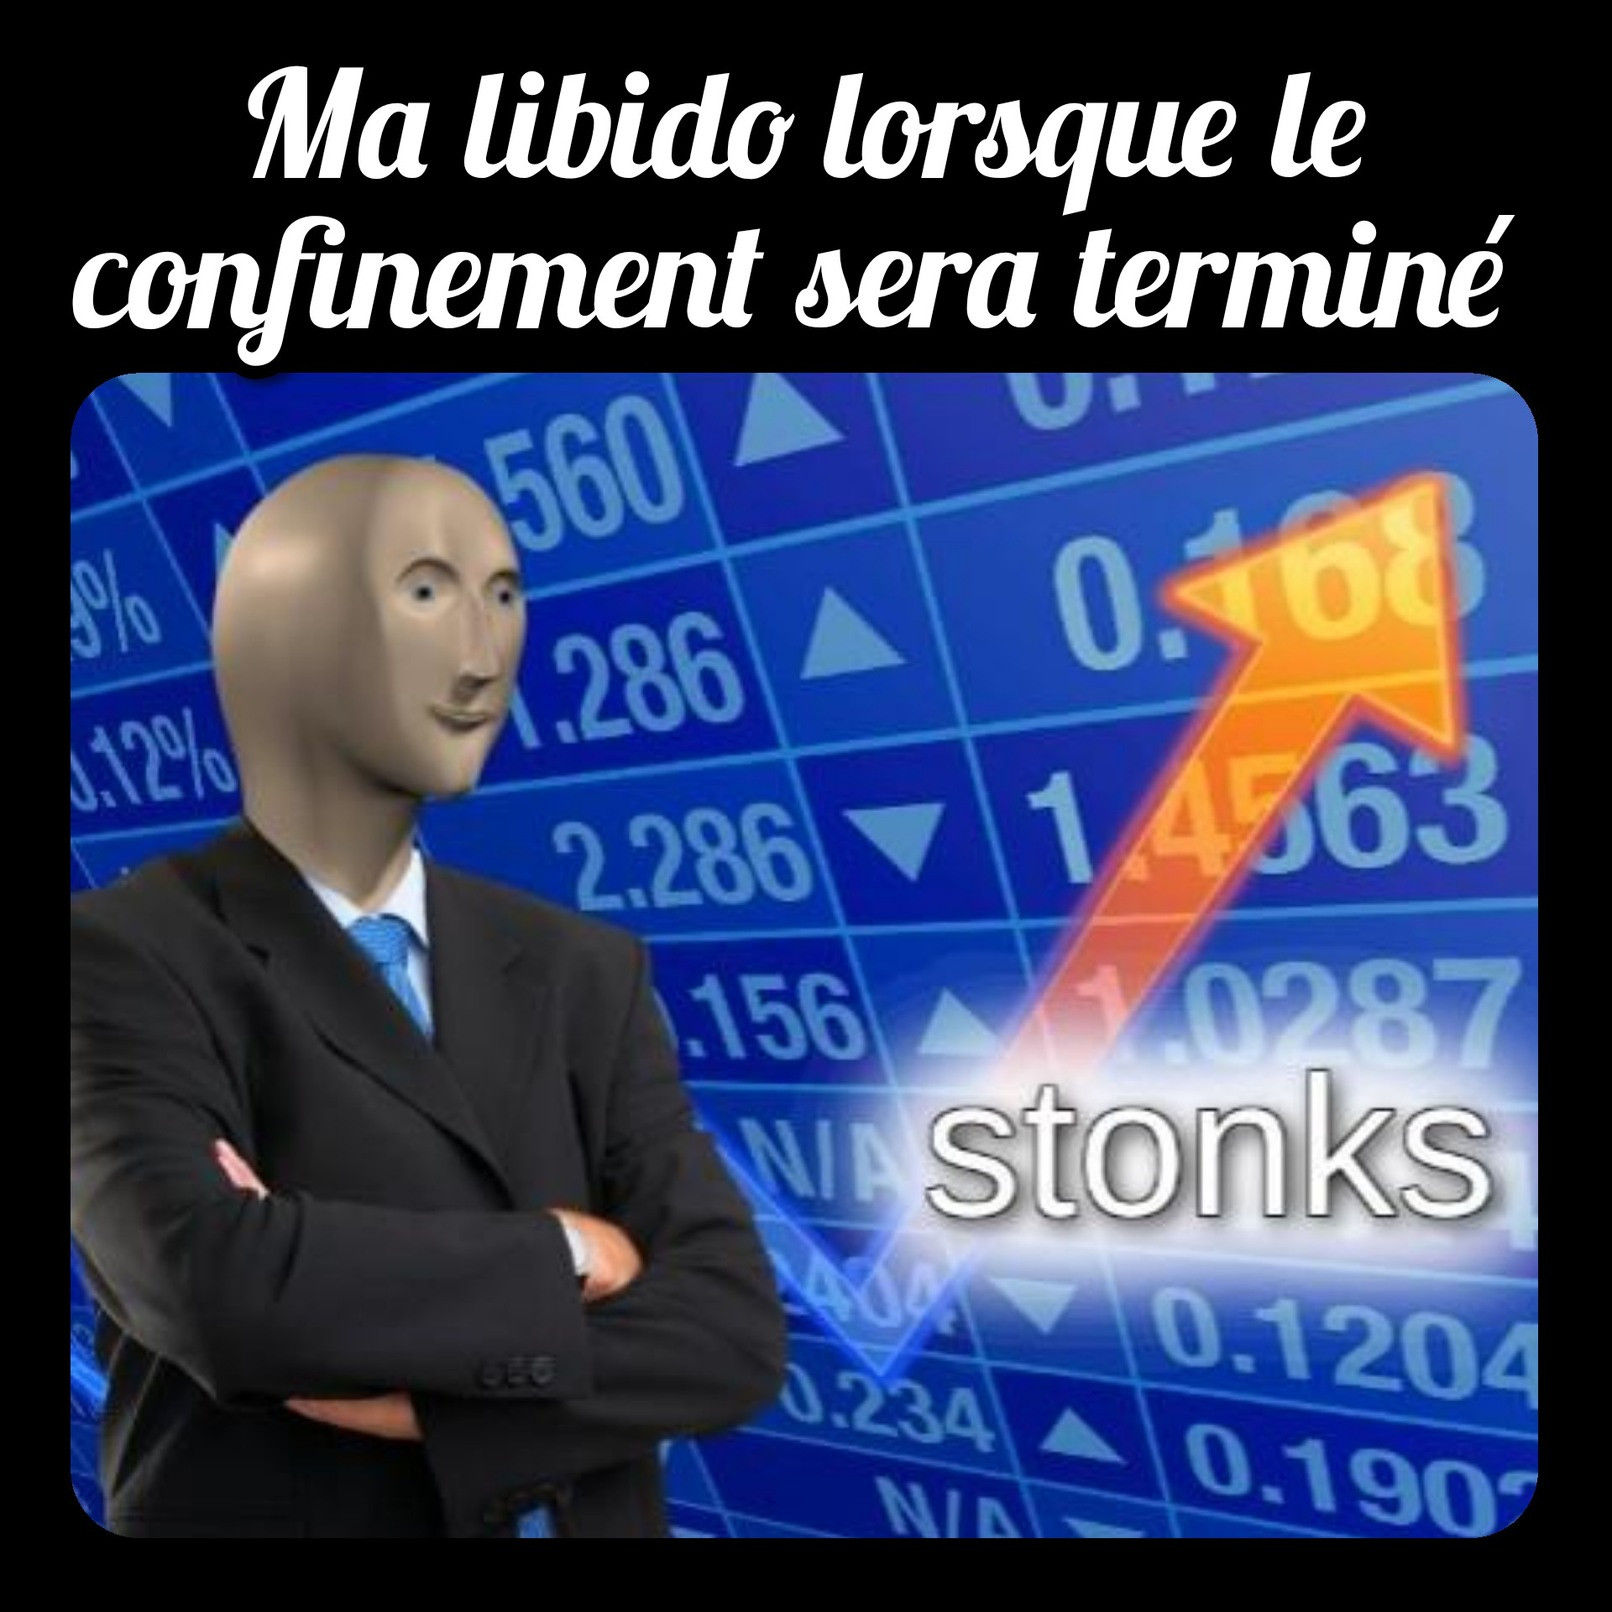 Carence charnelle - meme